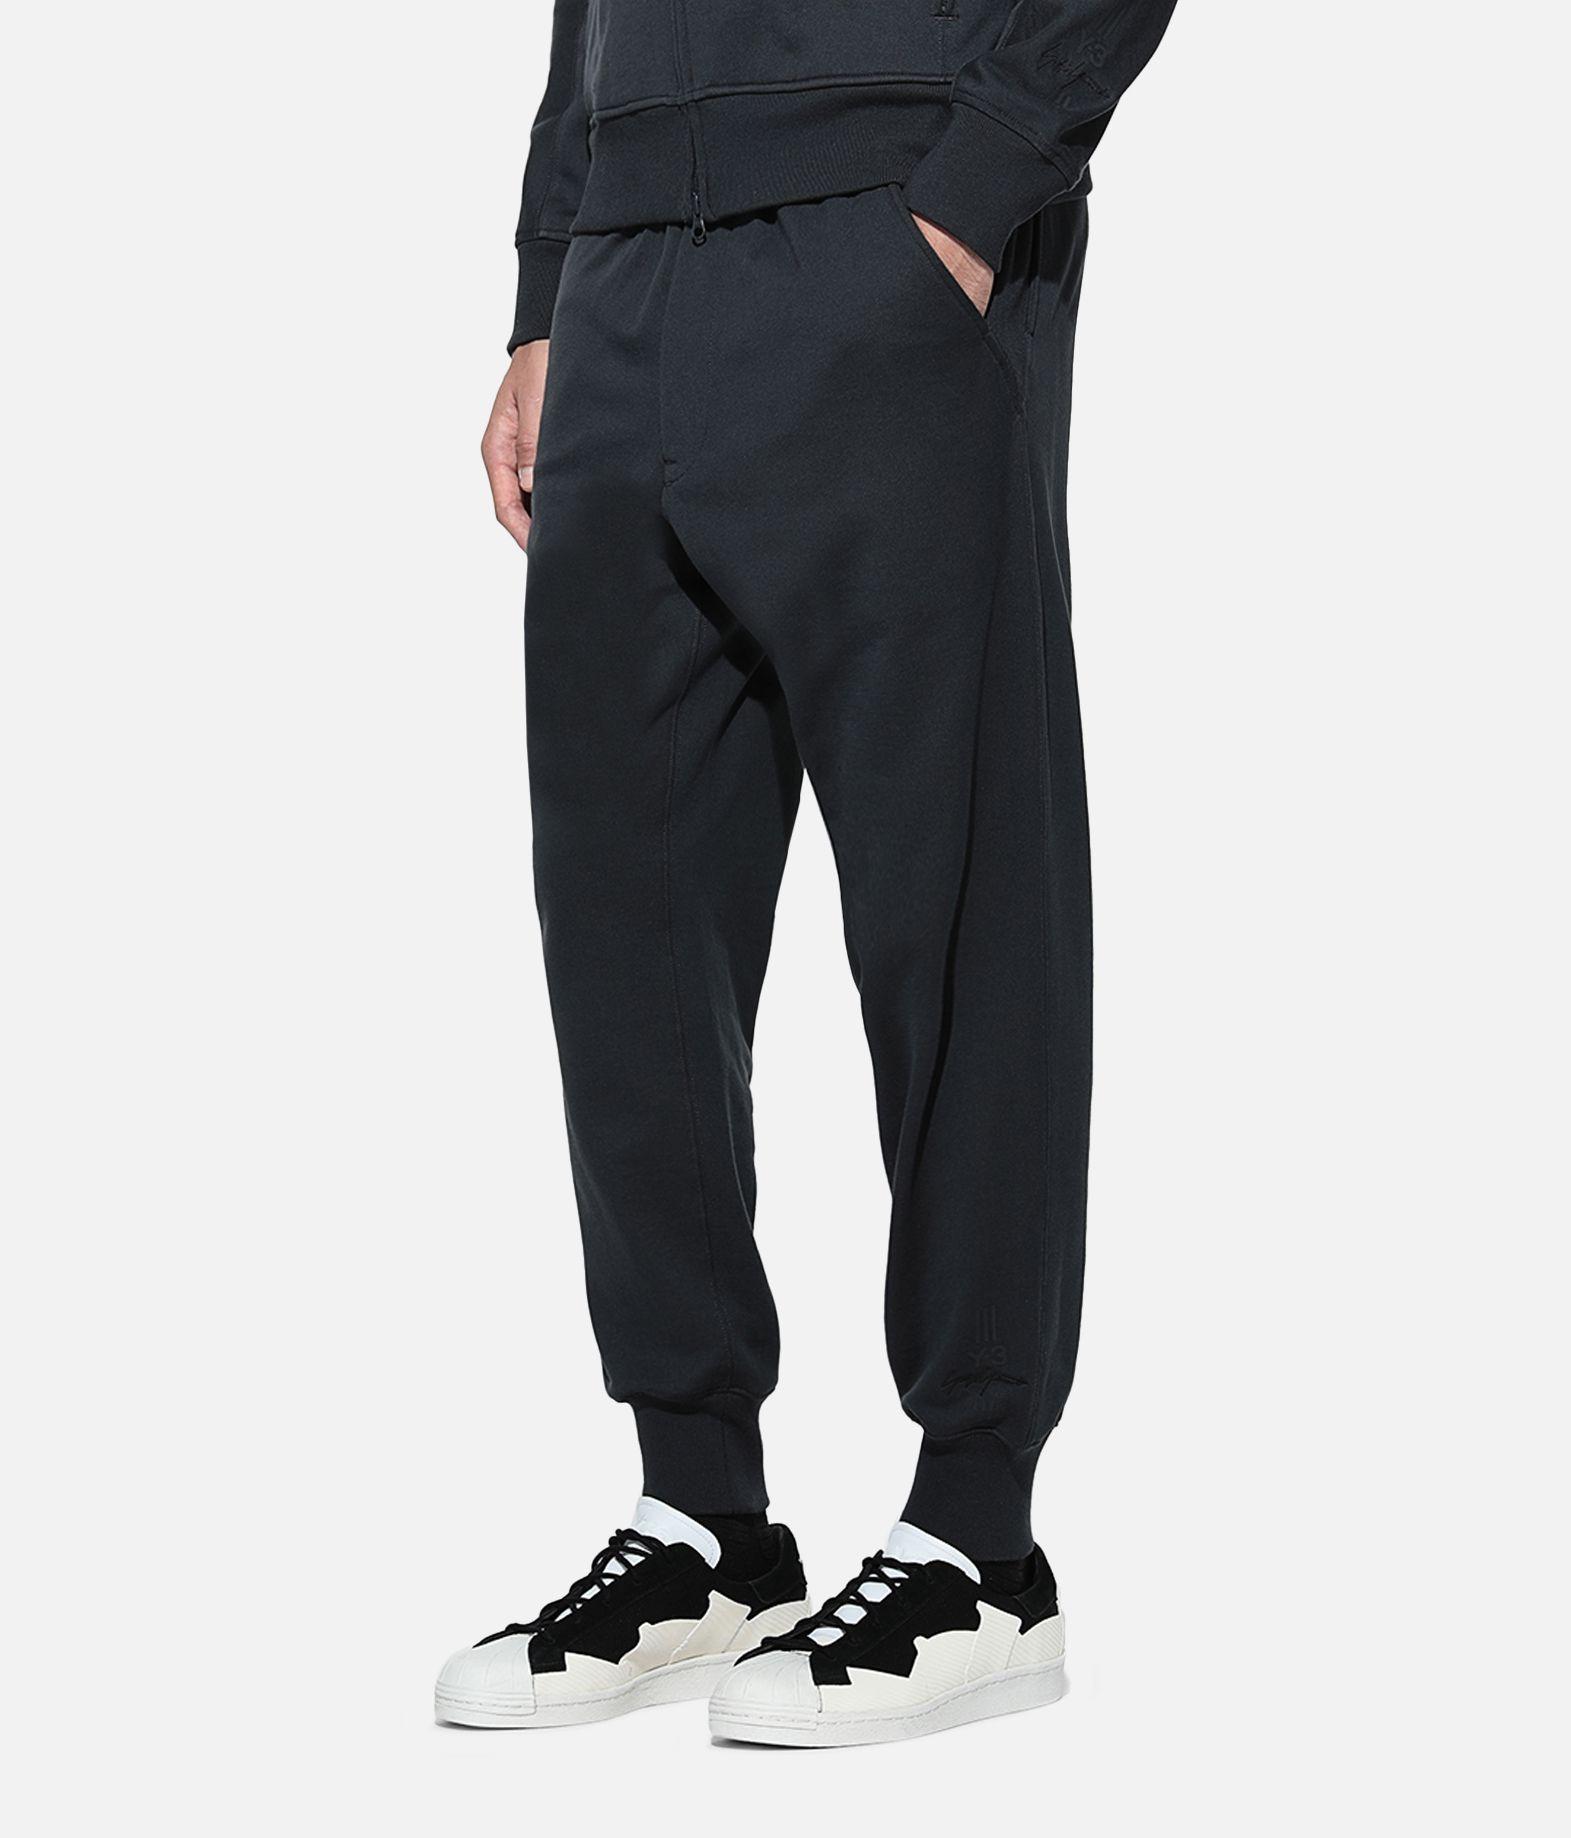 Y-3 Y-3 Classic Cuffed Pants Спортивные брюки Для Мужчин e